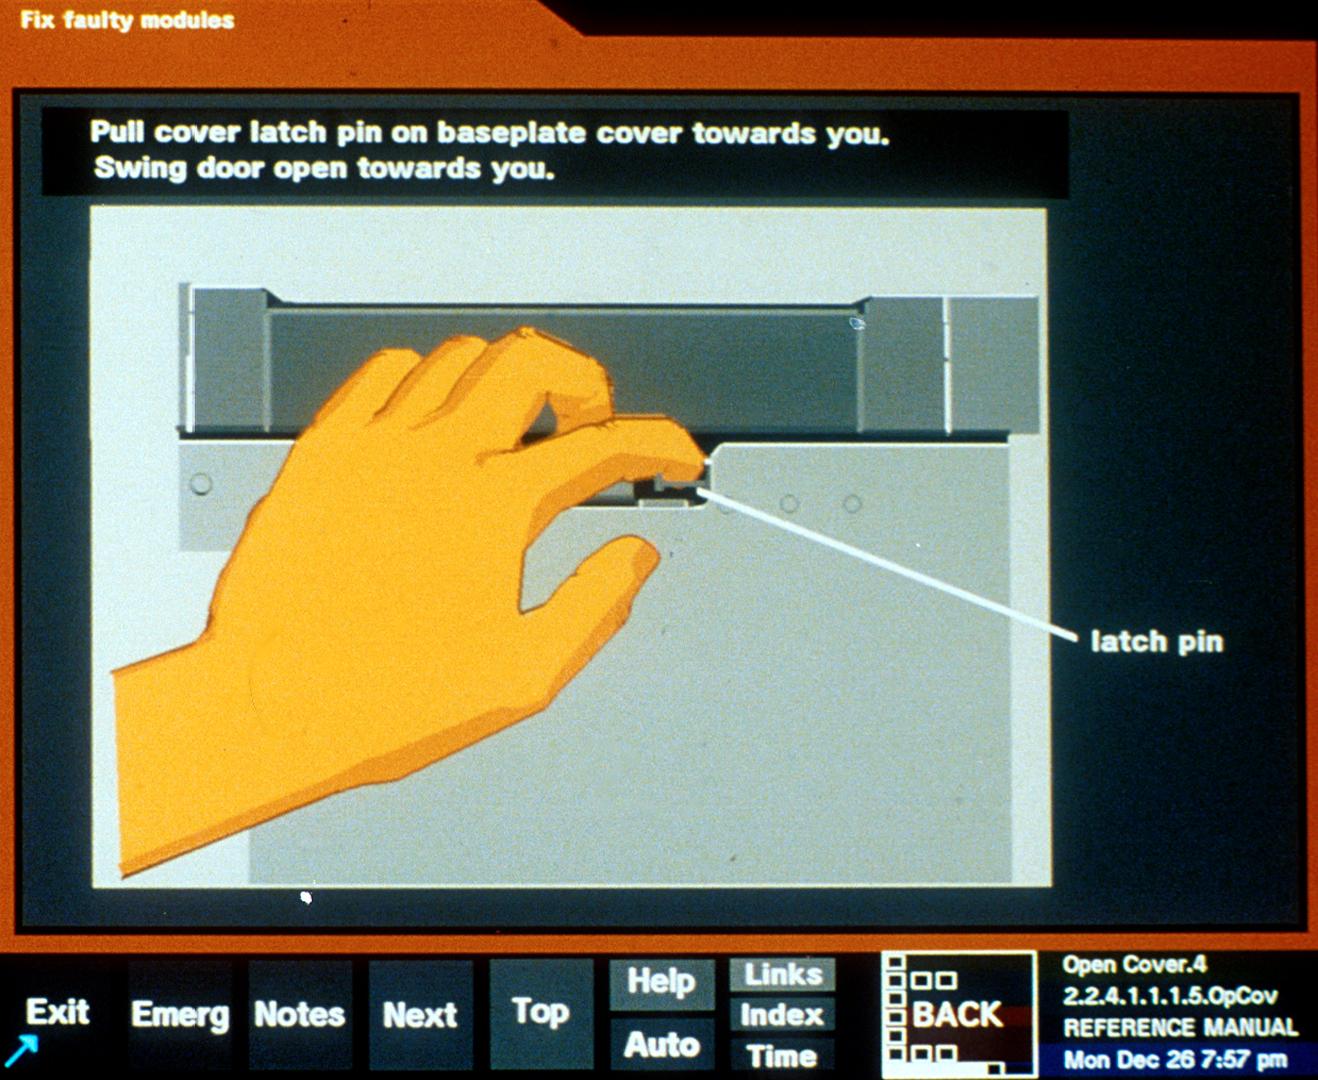 ©, Brown University, Maintenance Manual